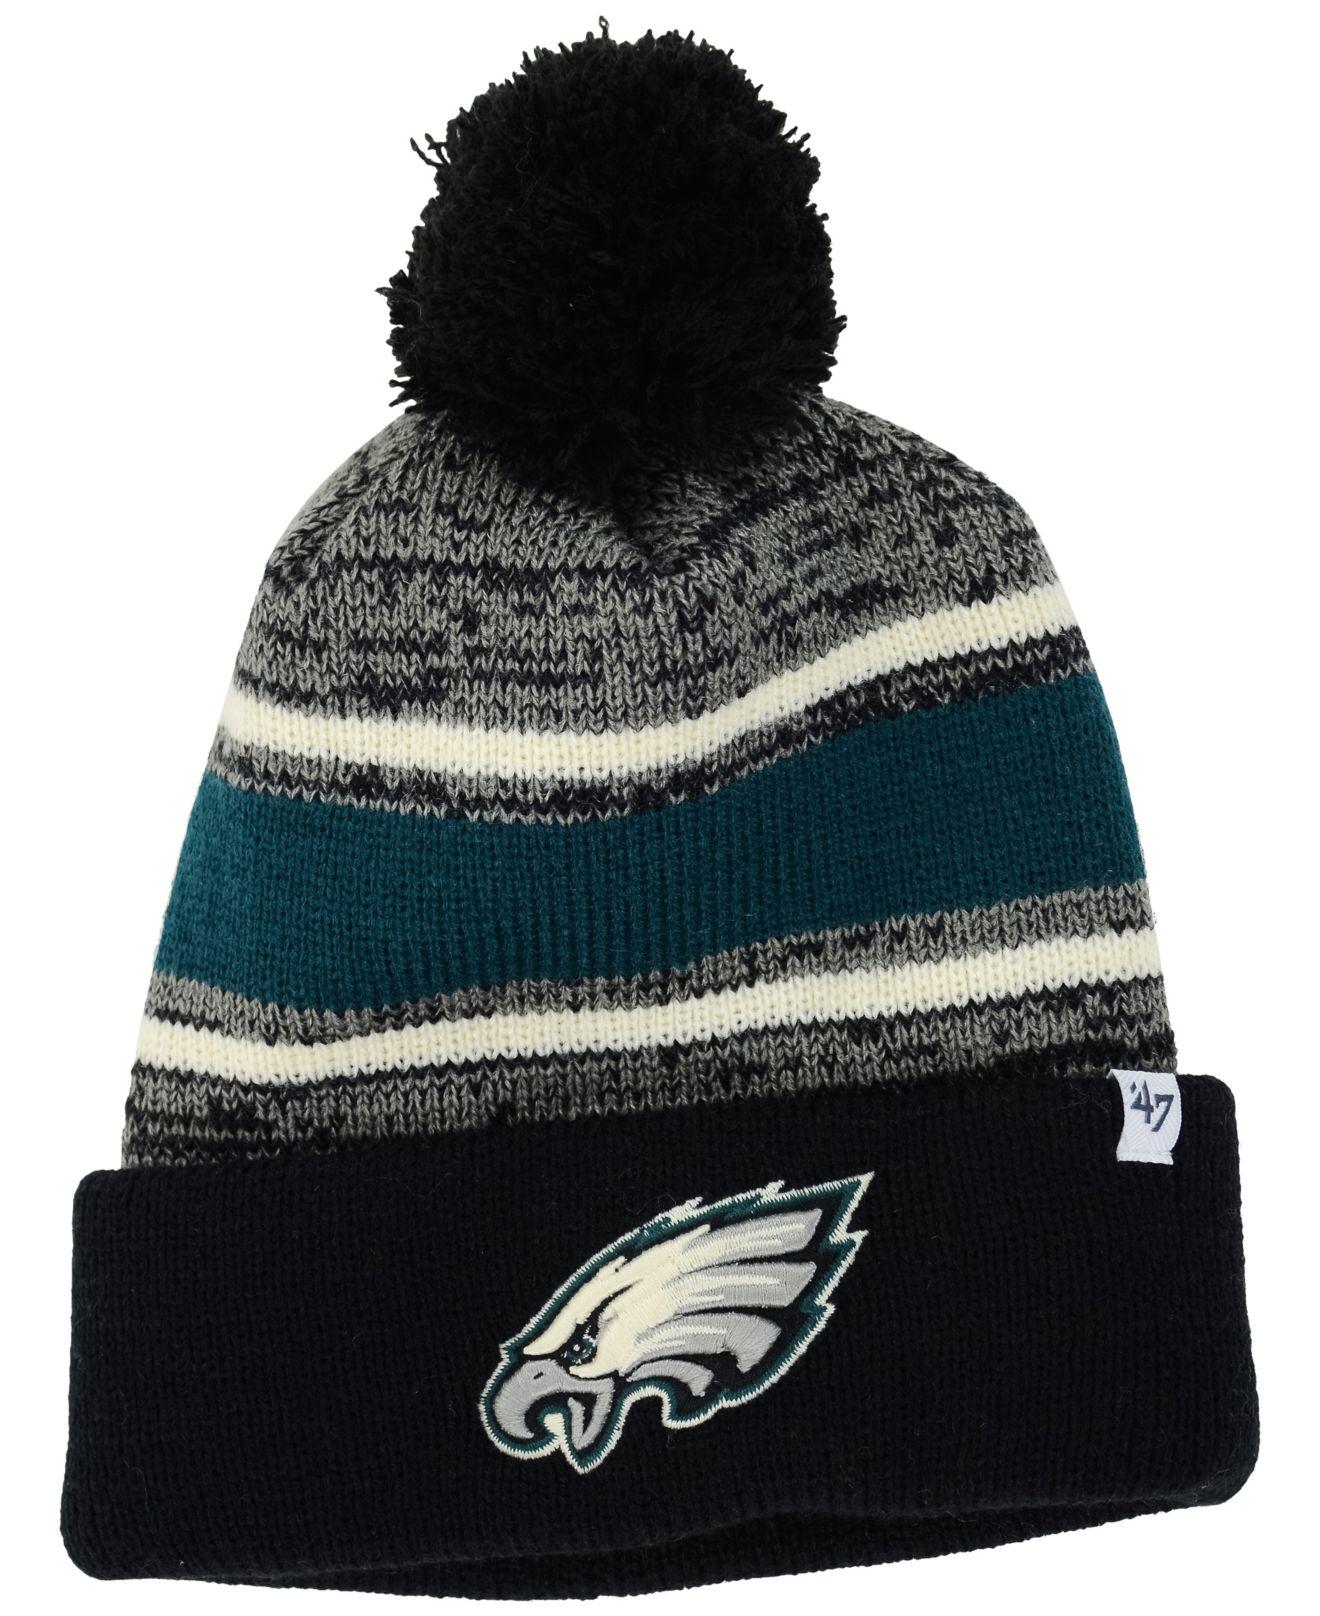 Lyst - 47 Brand Philadelphia Eagles Fairfax Pom Knit Hat in Black ... 97ad220e001